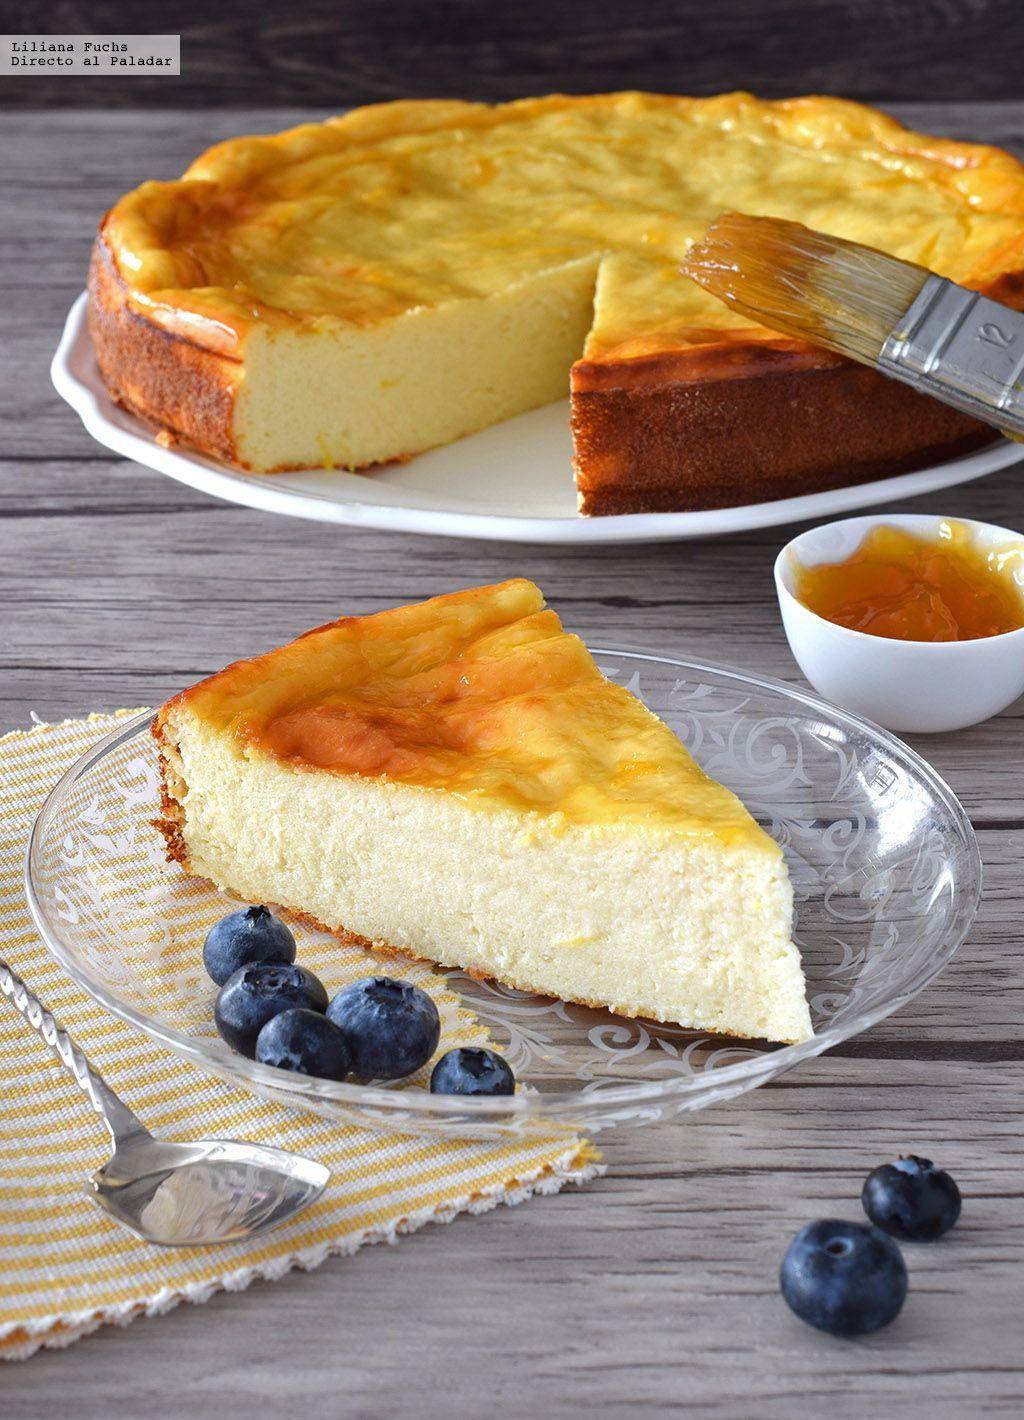 Tarta de queso y yogur al limón. Receta fresquita de postre